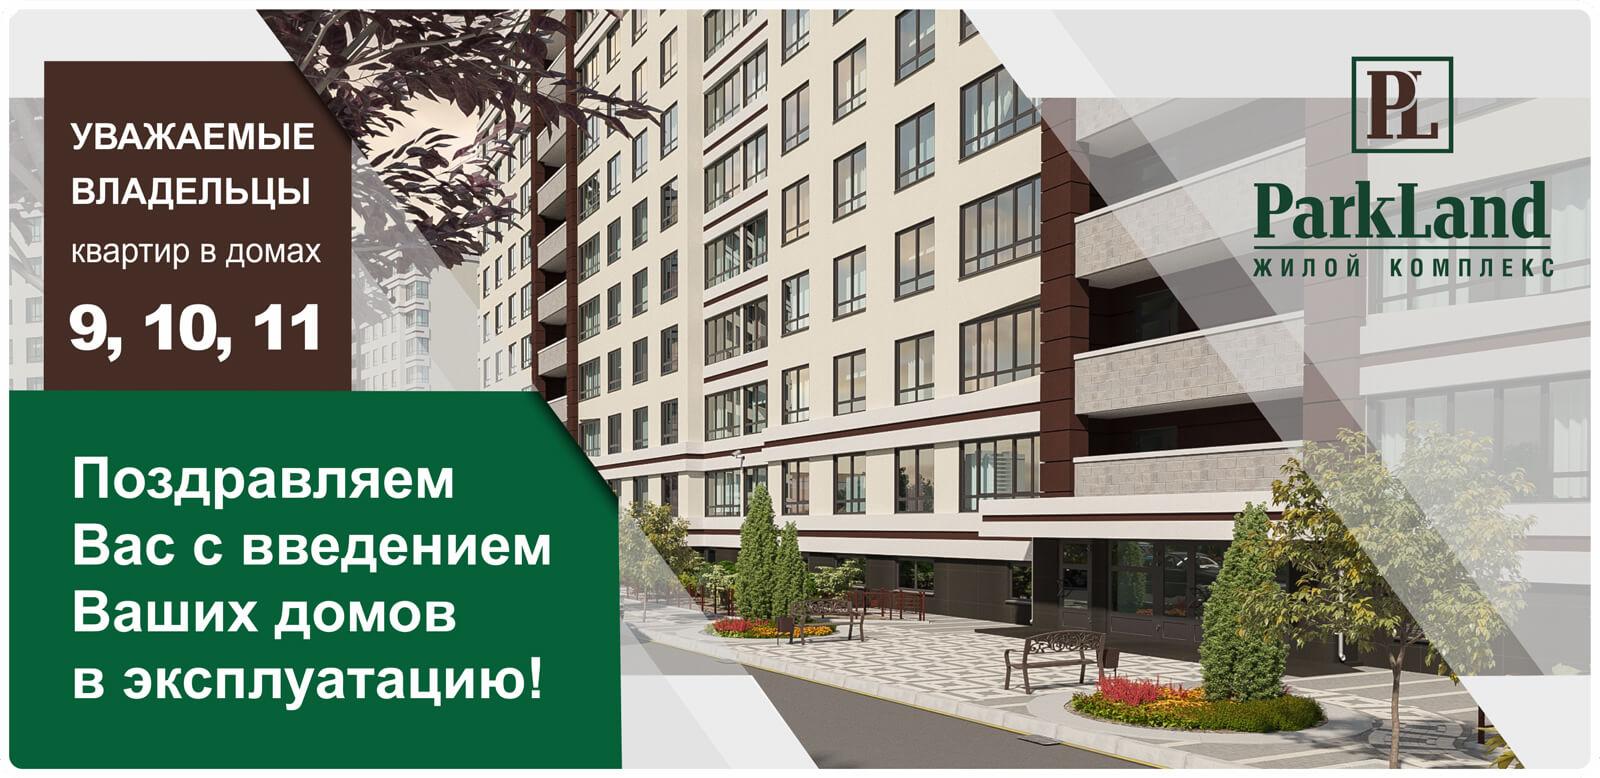 news290717_ru